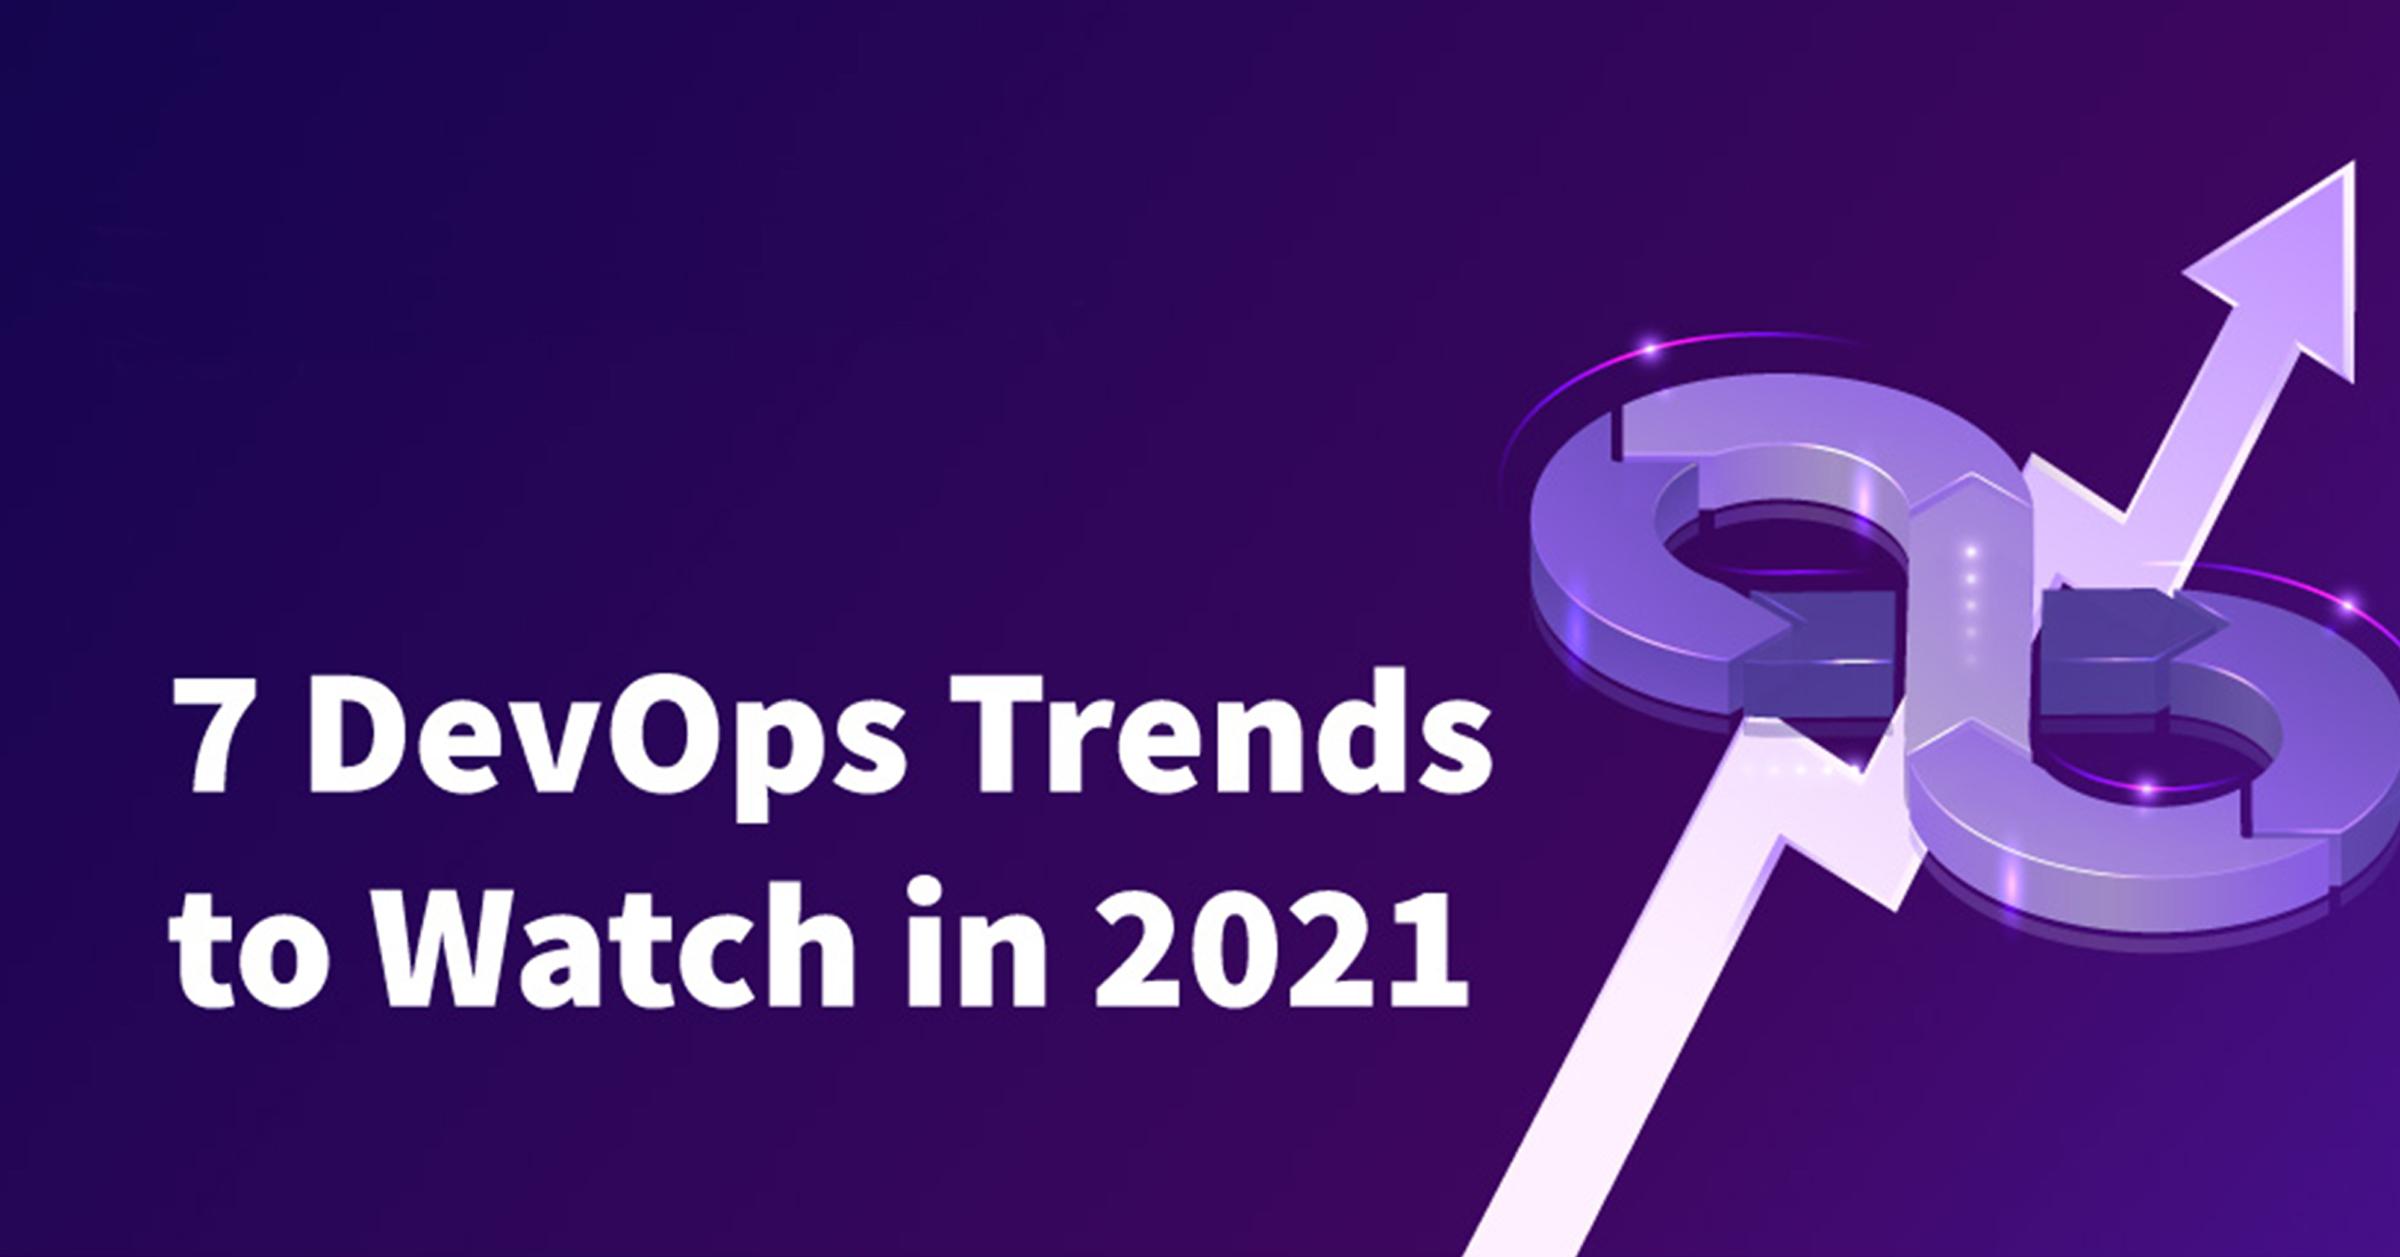 7 DevOps Trends to Watch in 2021 [Infographic]